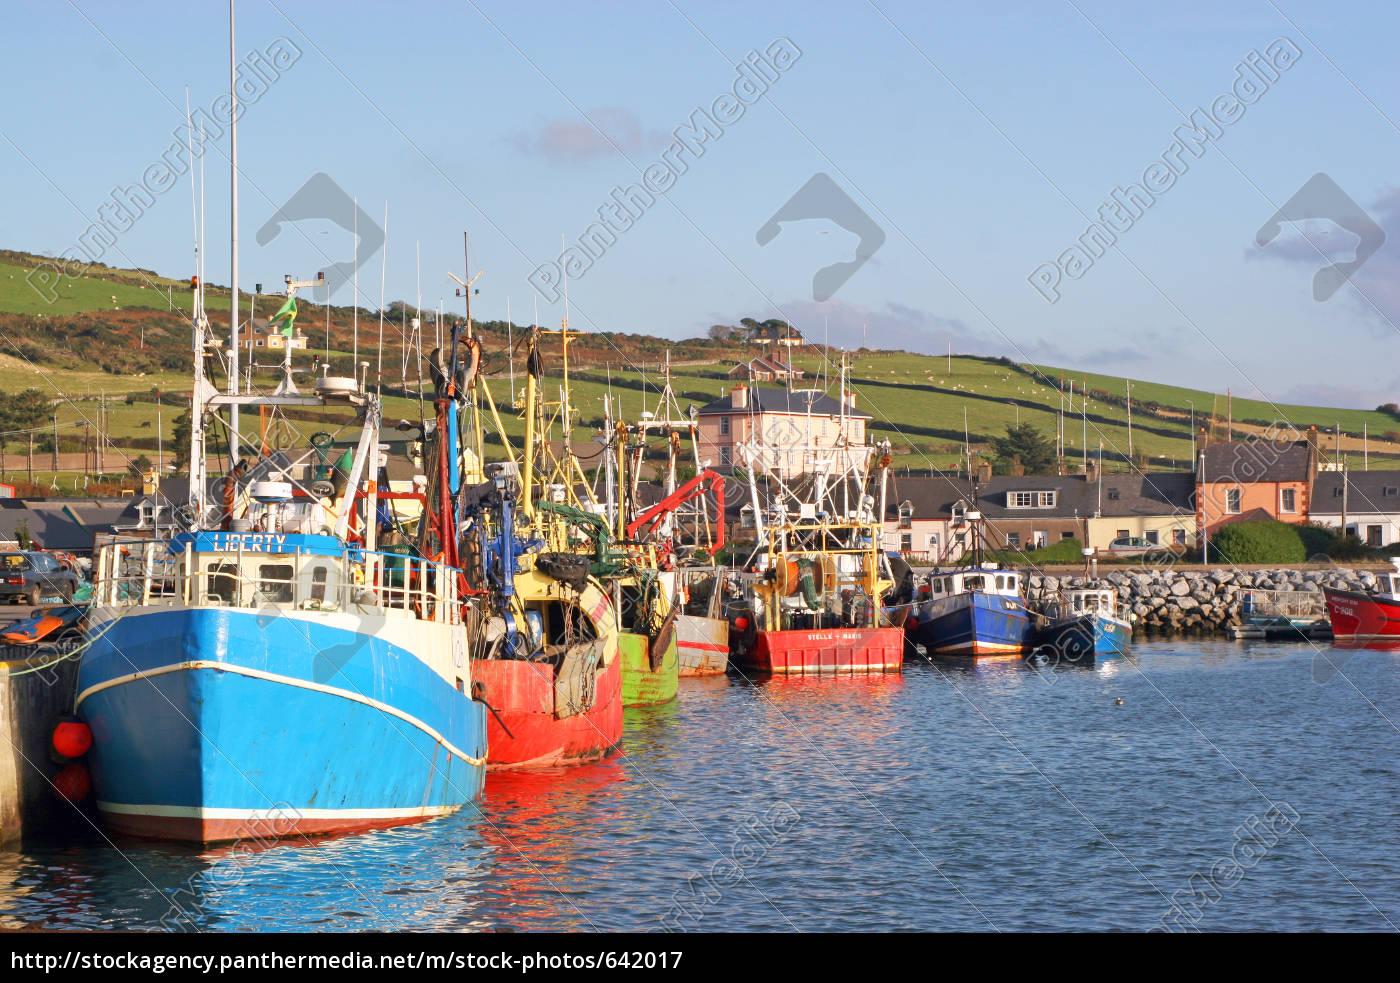 harbor, scenery, in, ireland - 642017